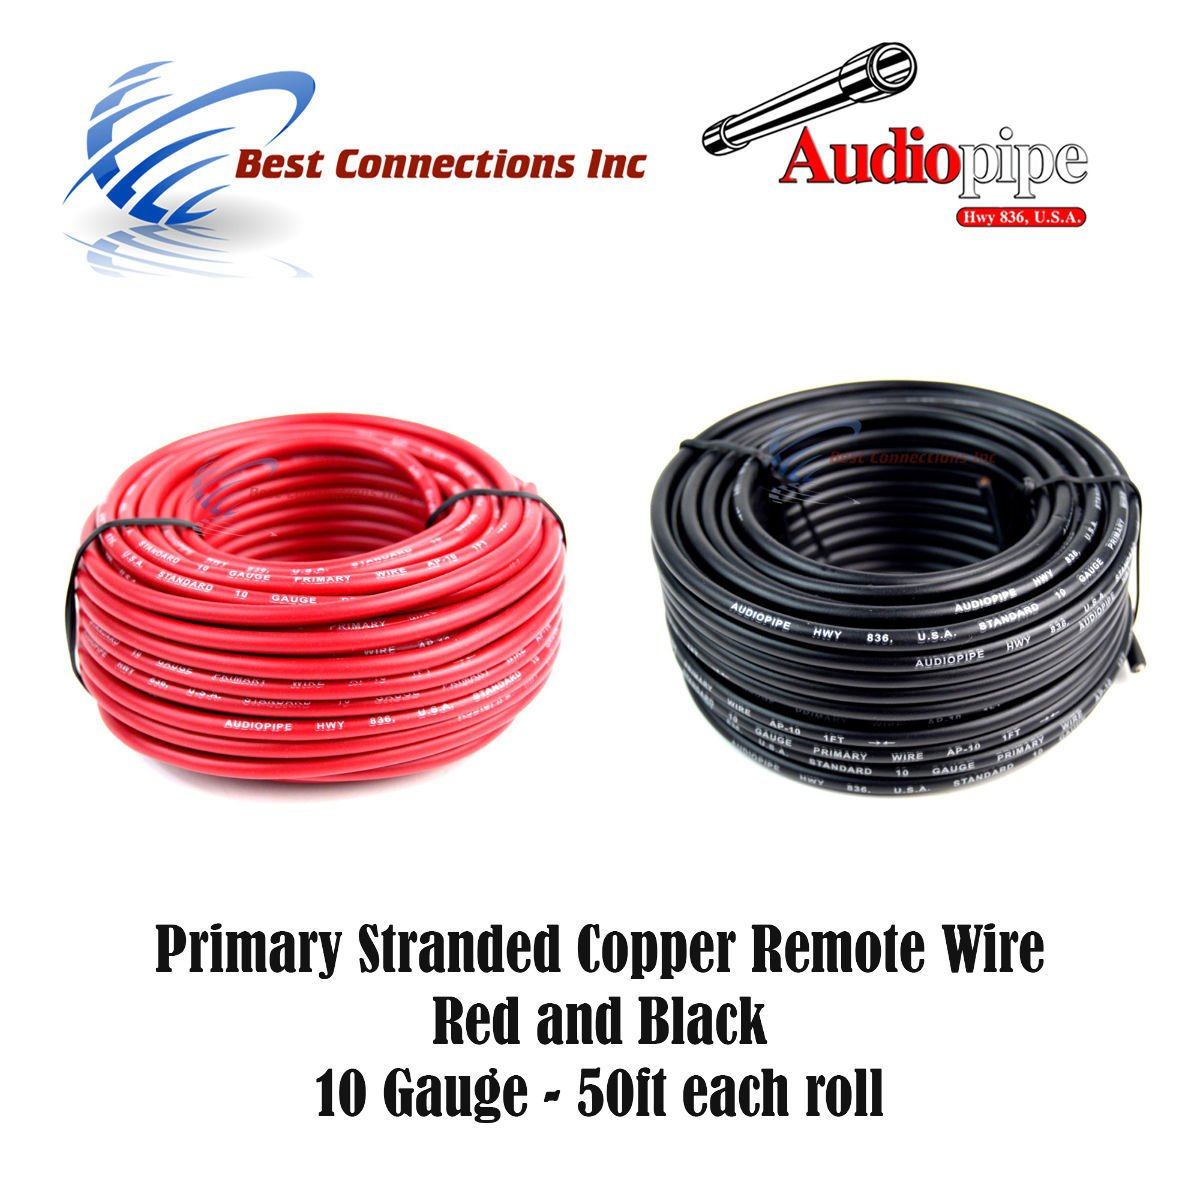 Amazon.com: 10 GAUGE WIRE RED & BLACK POWER GROUND 50 FT EACH ...